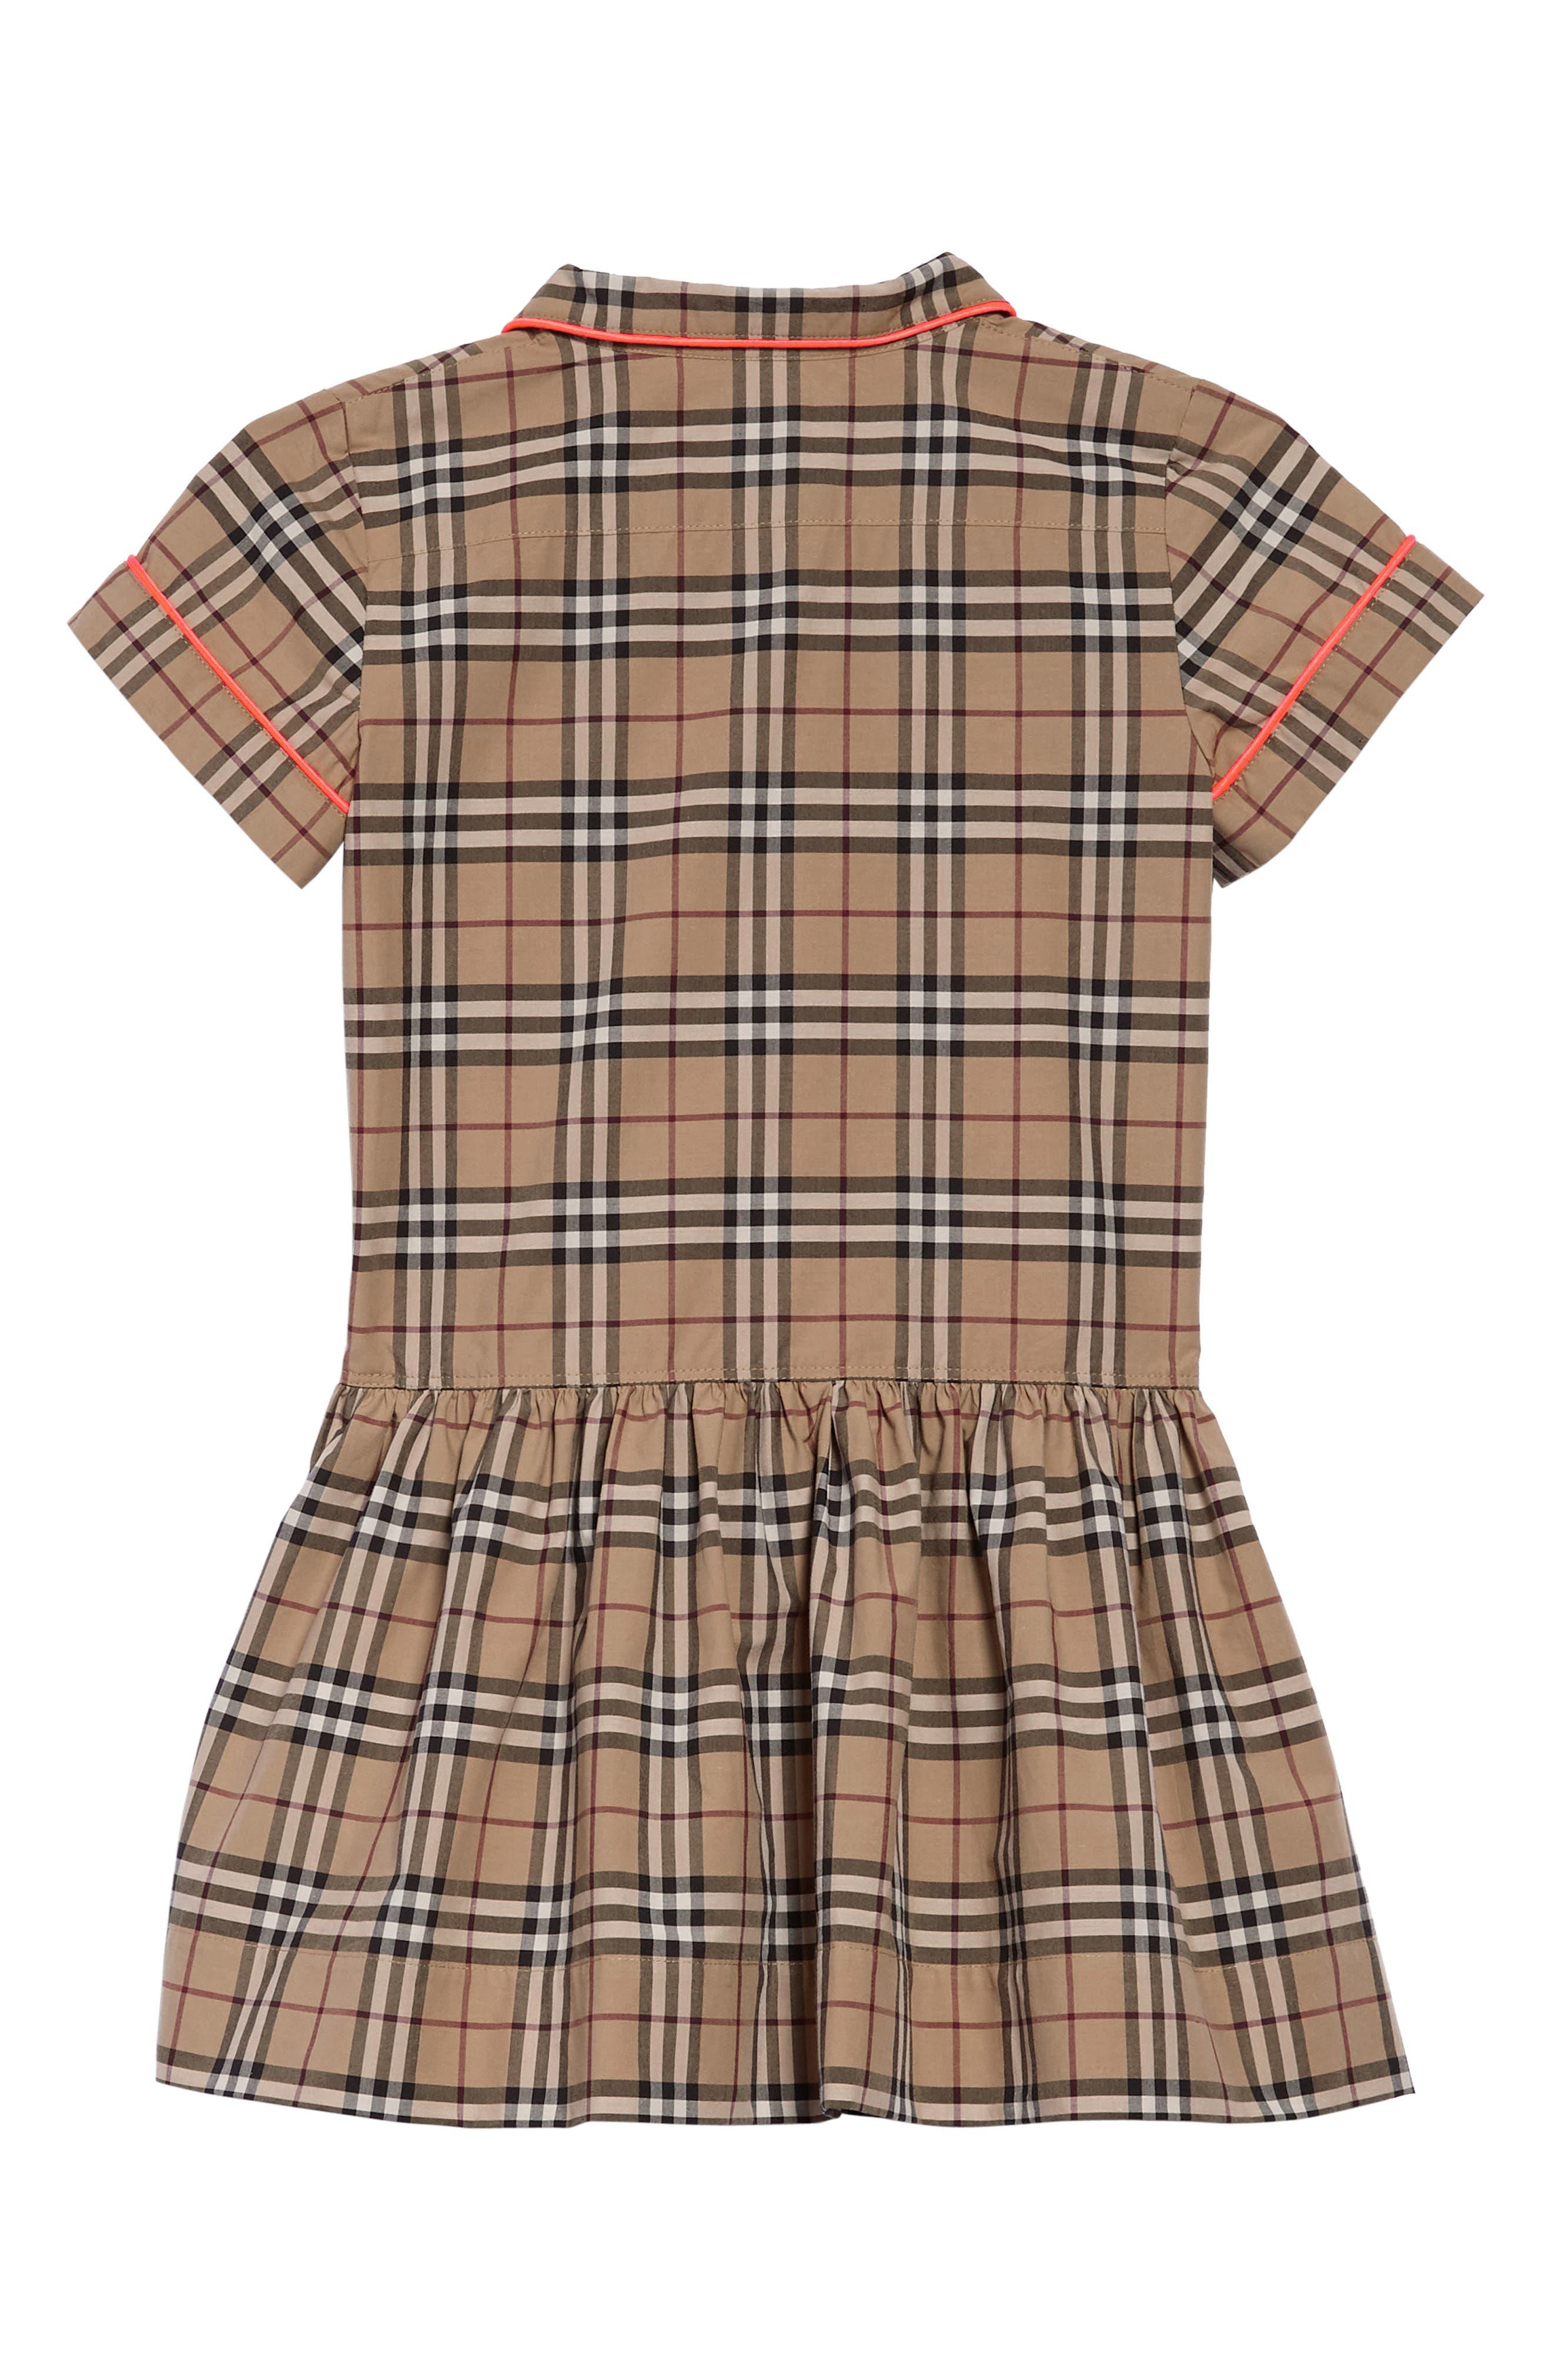 Melanie Drop Waist Dress,                             Alternate thumbnail 2, color,                             250